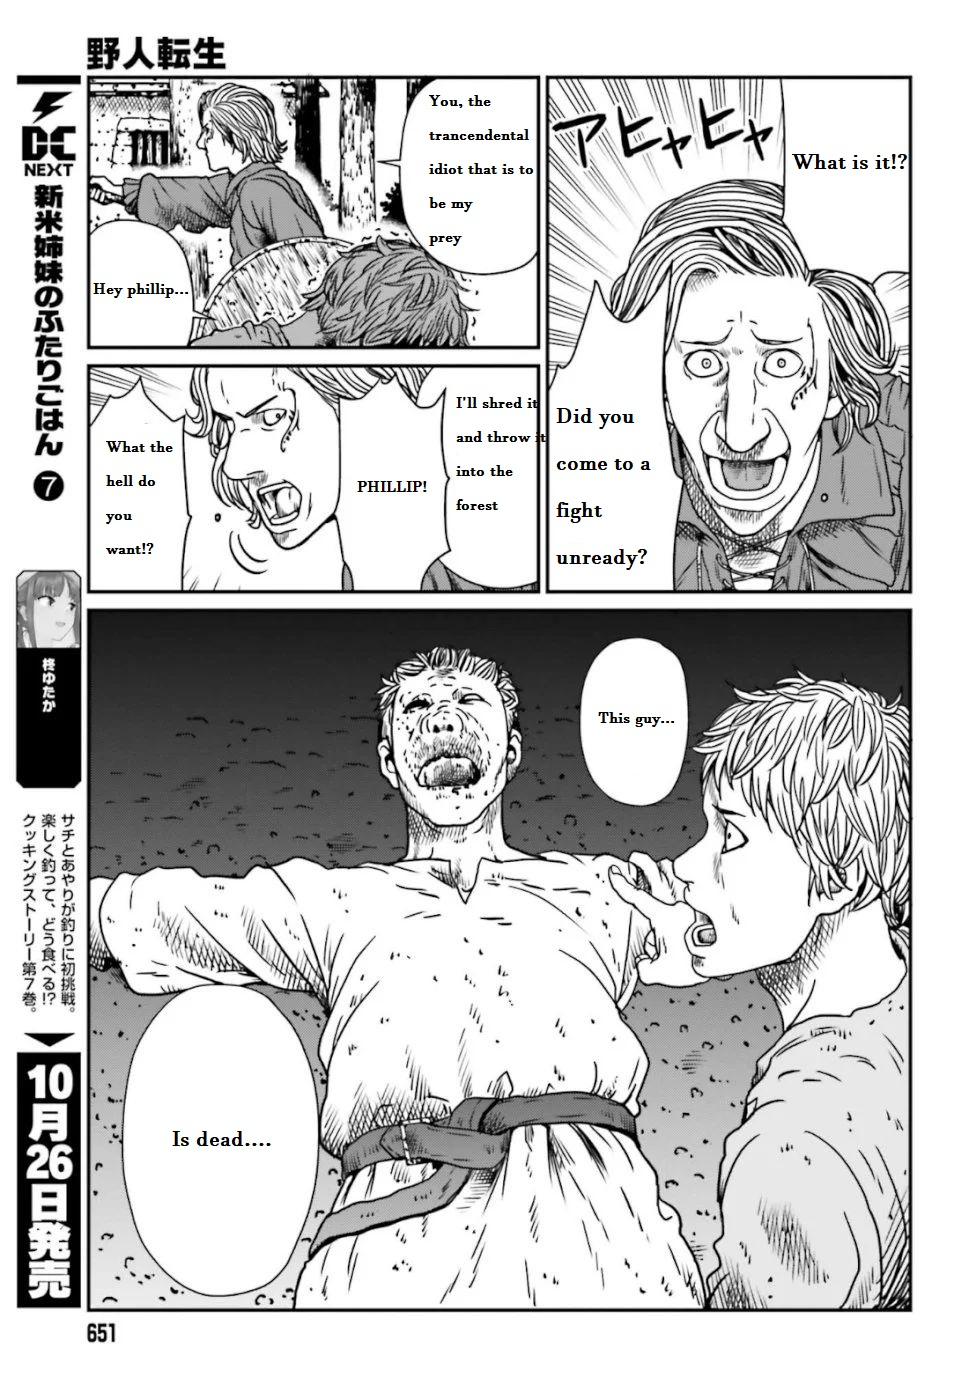 Yajin Tensei: Karate Survivor In Another World - chapter 5.1-eng-li